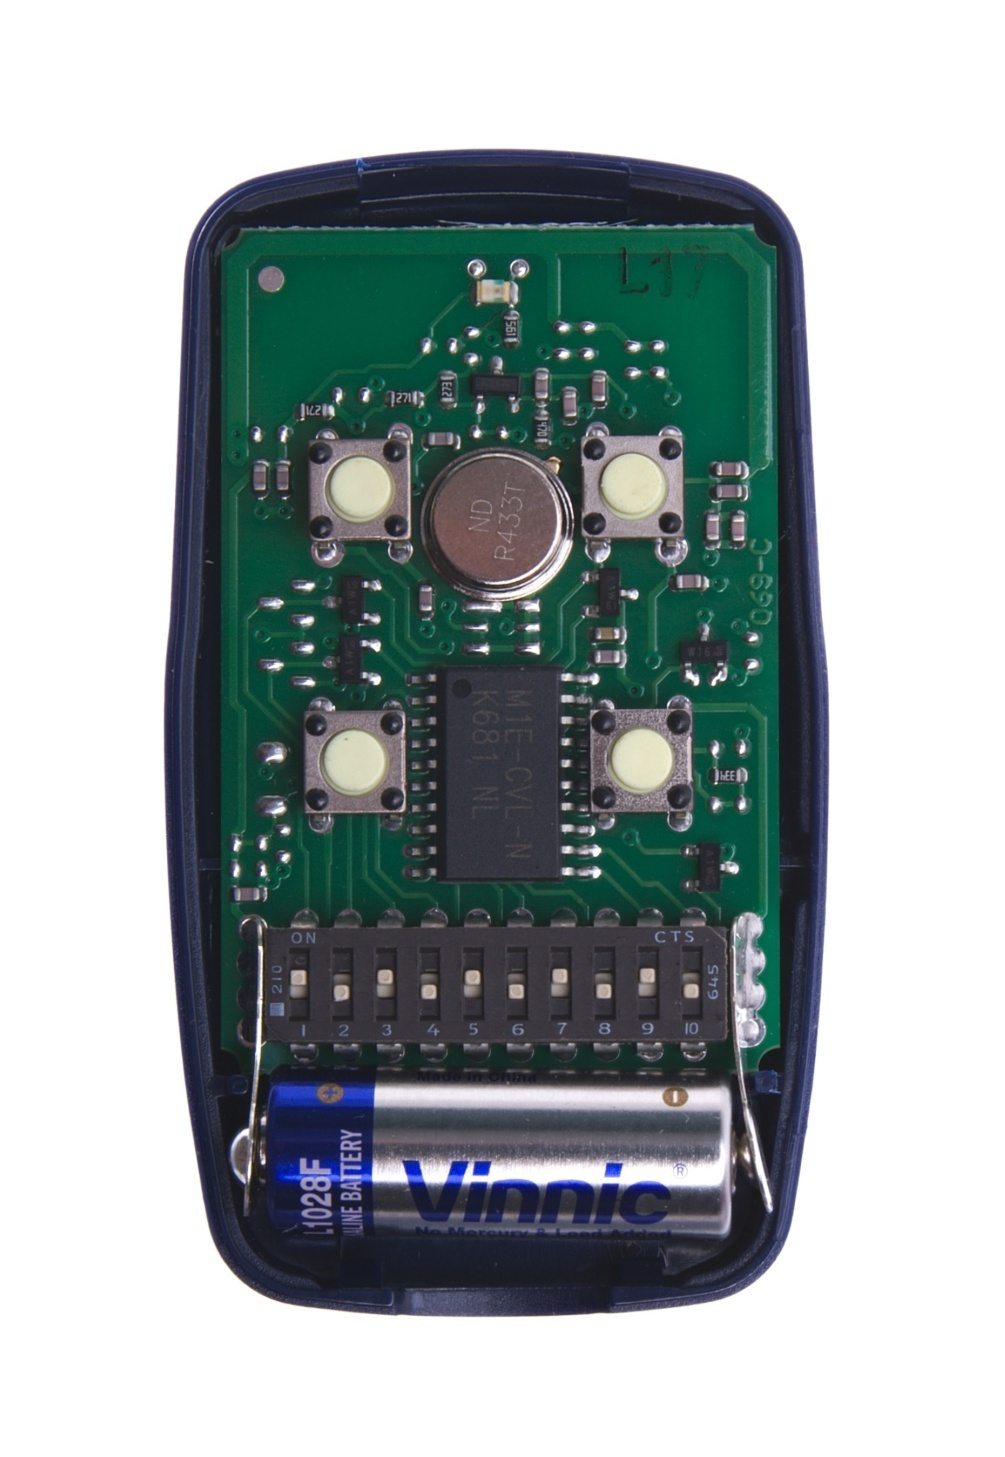 Nice FLO4 čtyřkanálový dálkový ovladač s pevným kódem